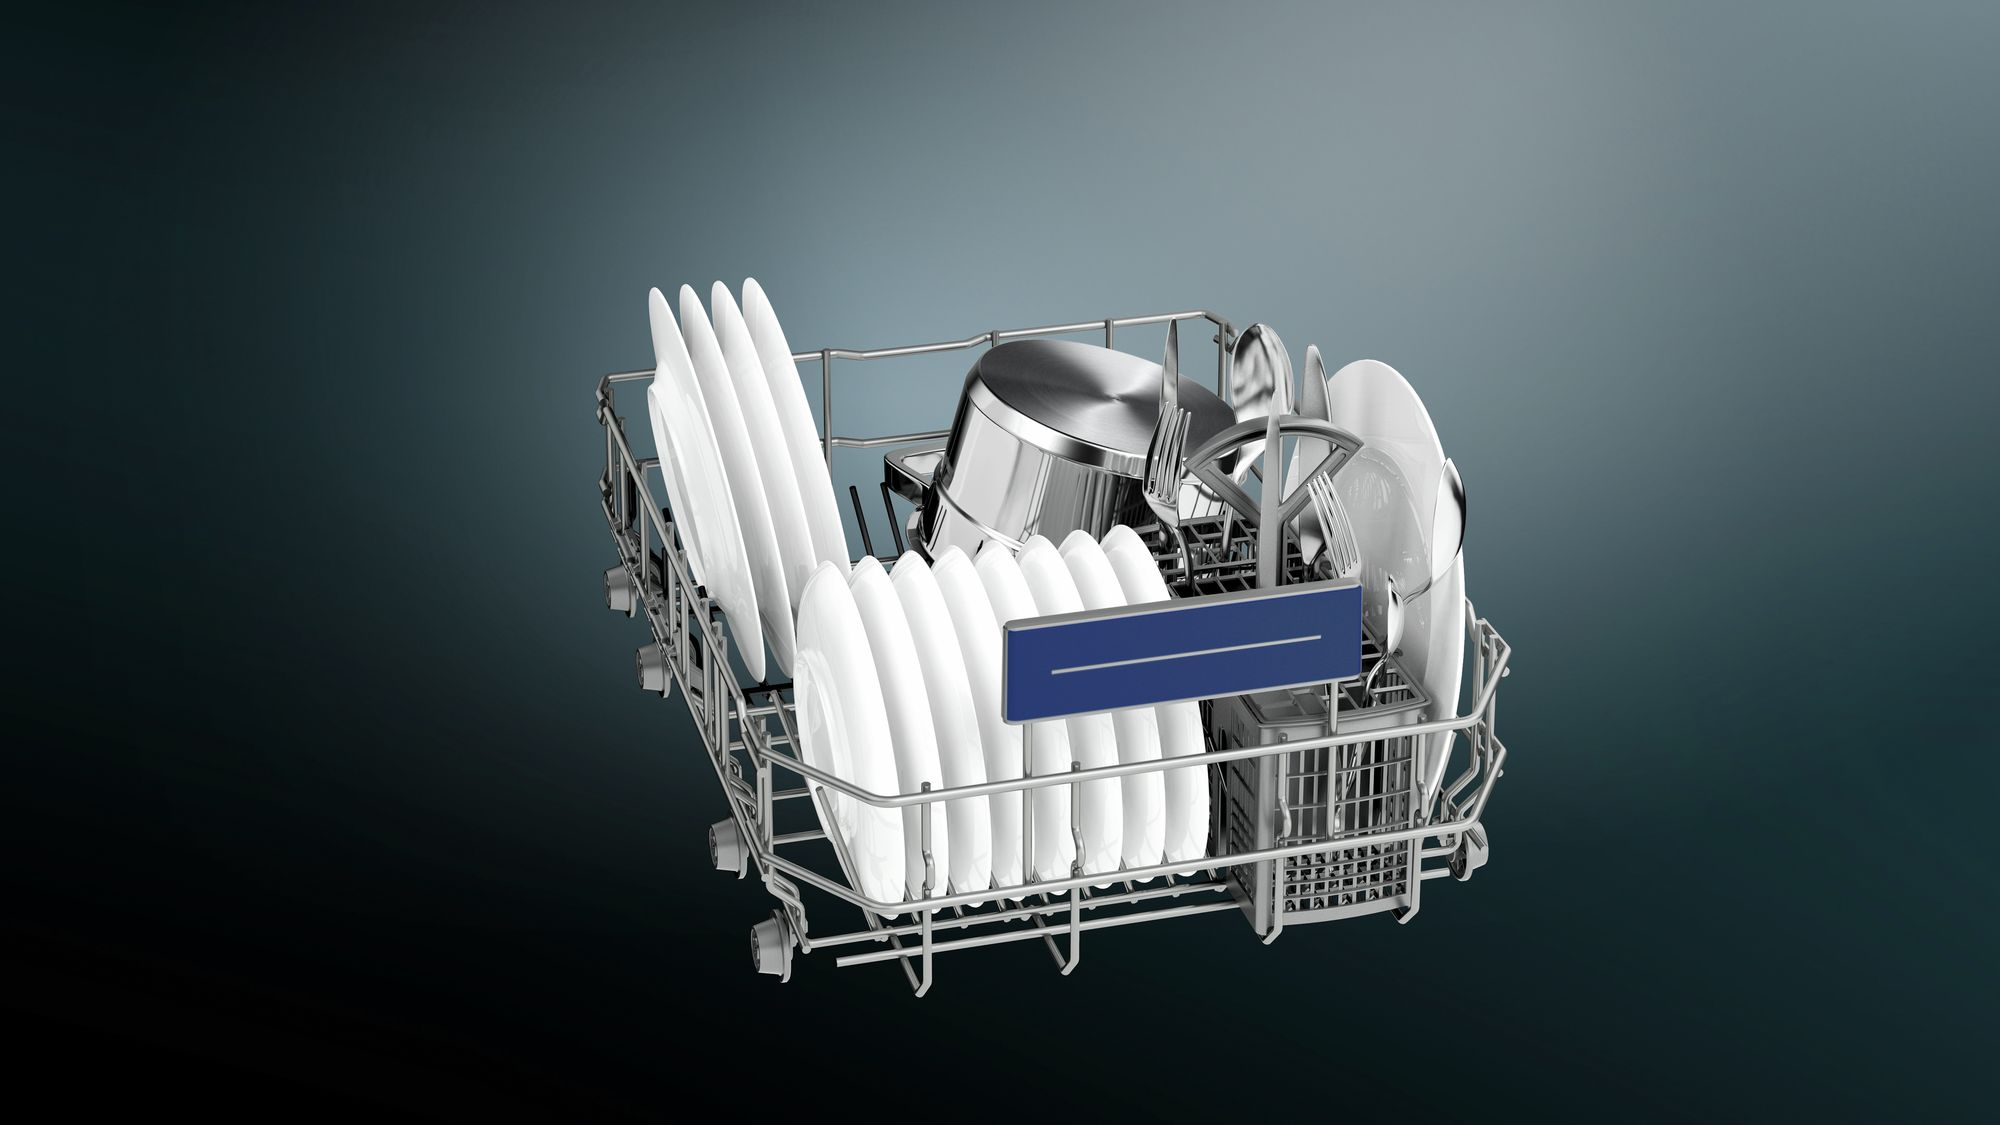 Siemens Geschirrspüler Speedmatic Stand Weiß 45 Cm